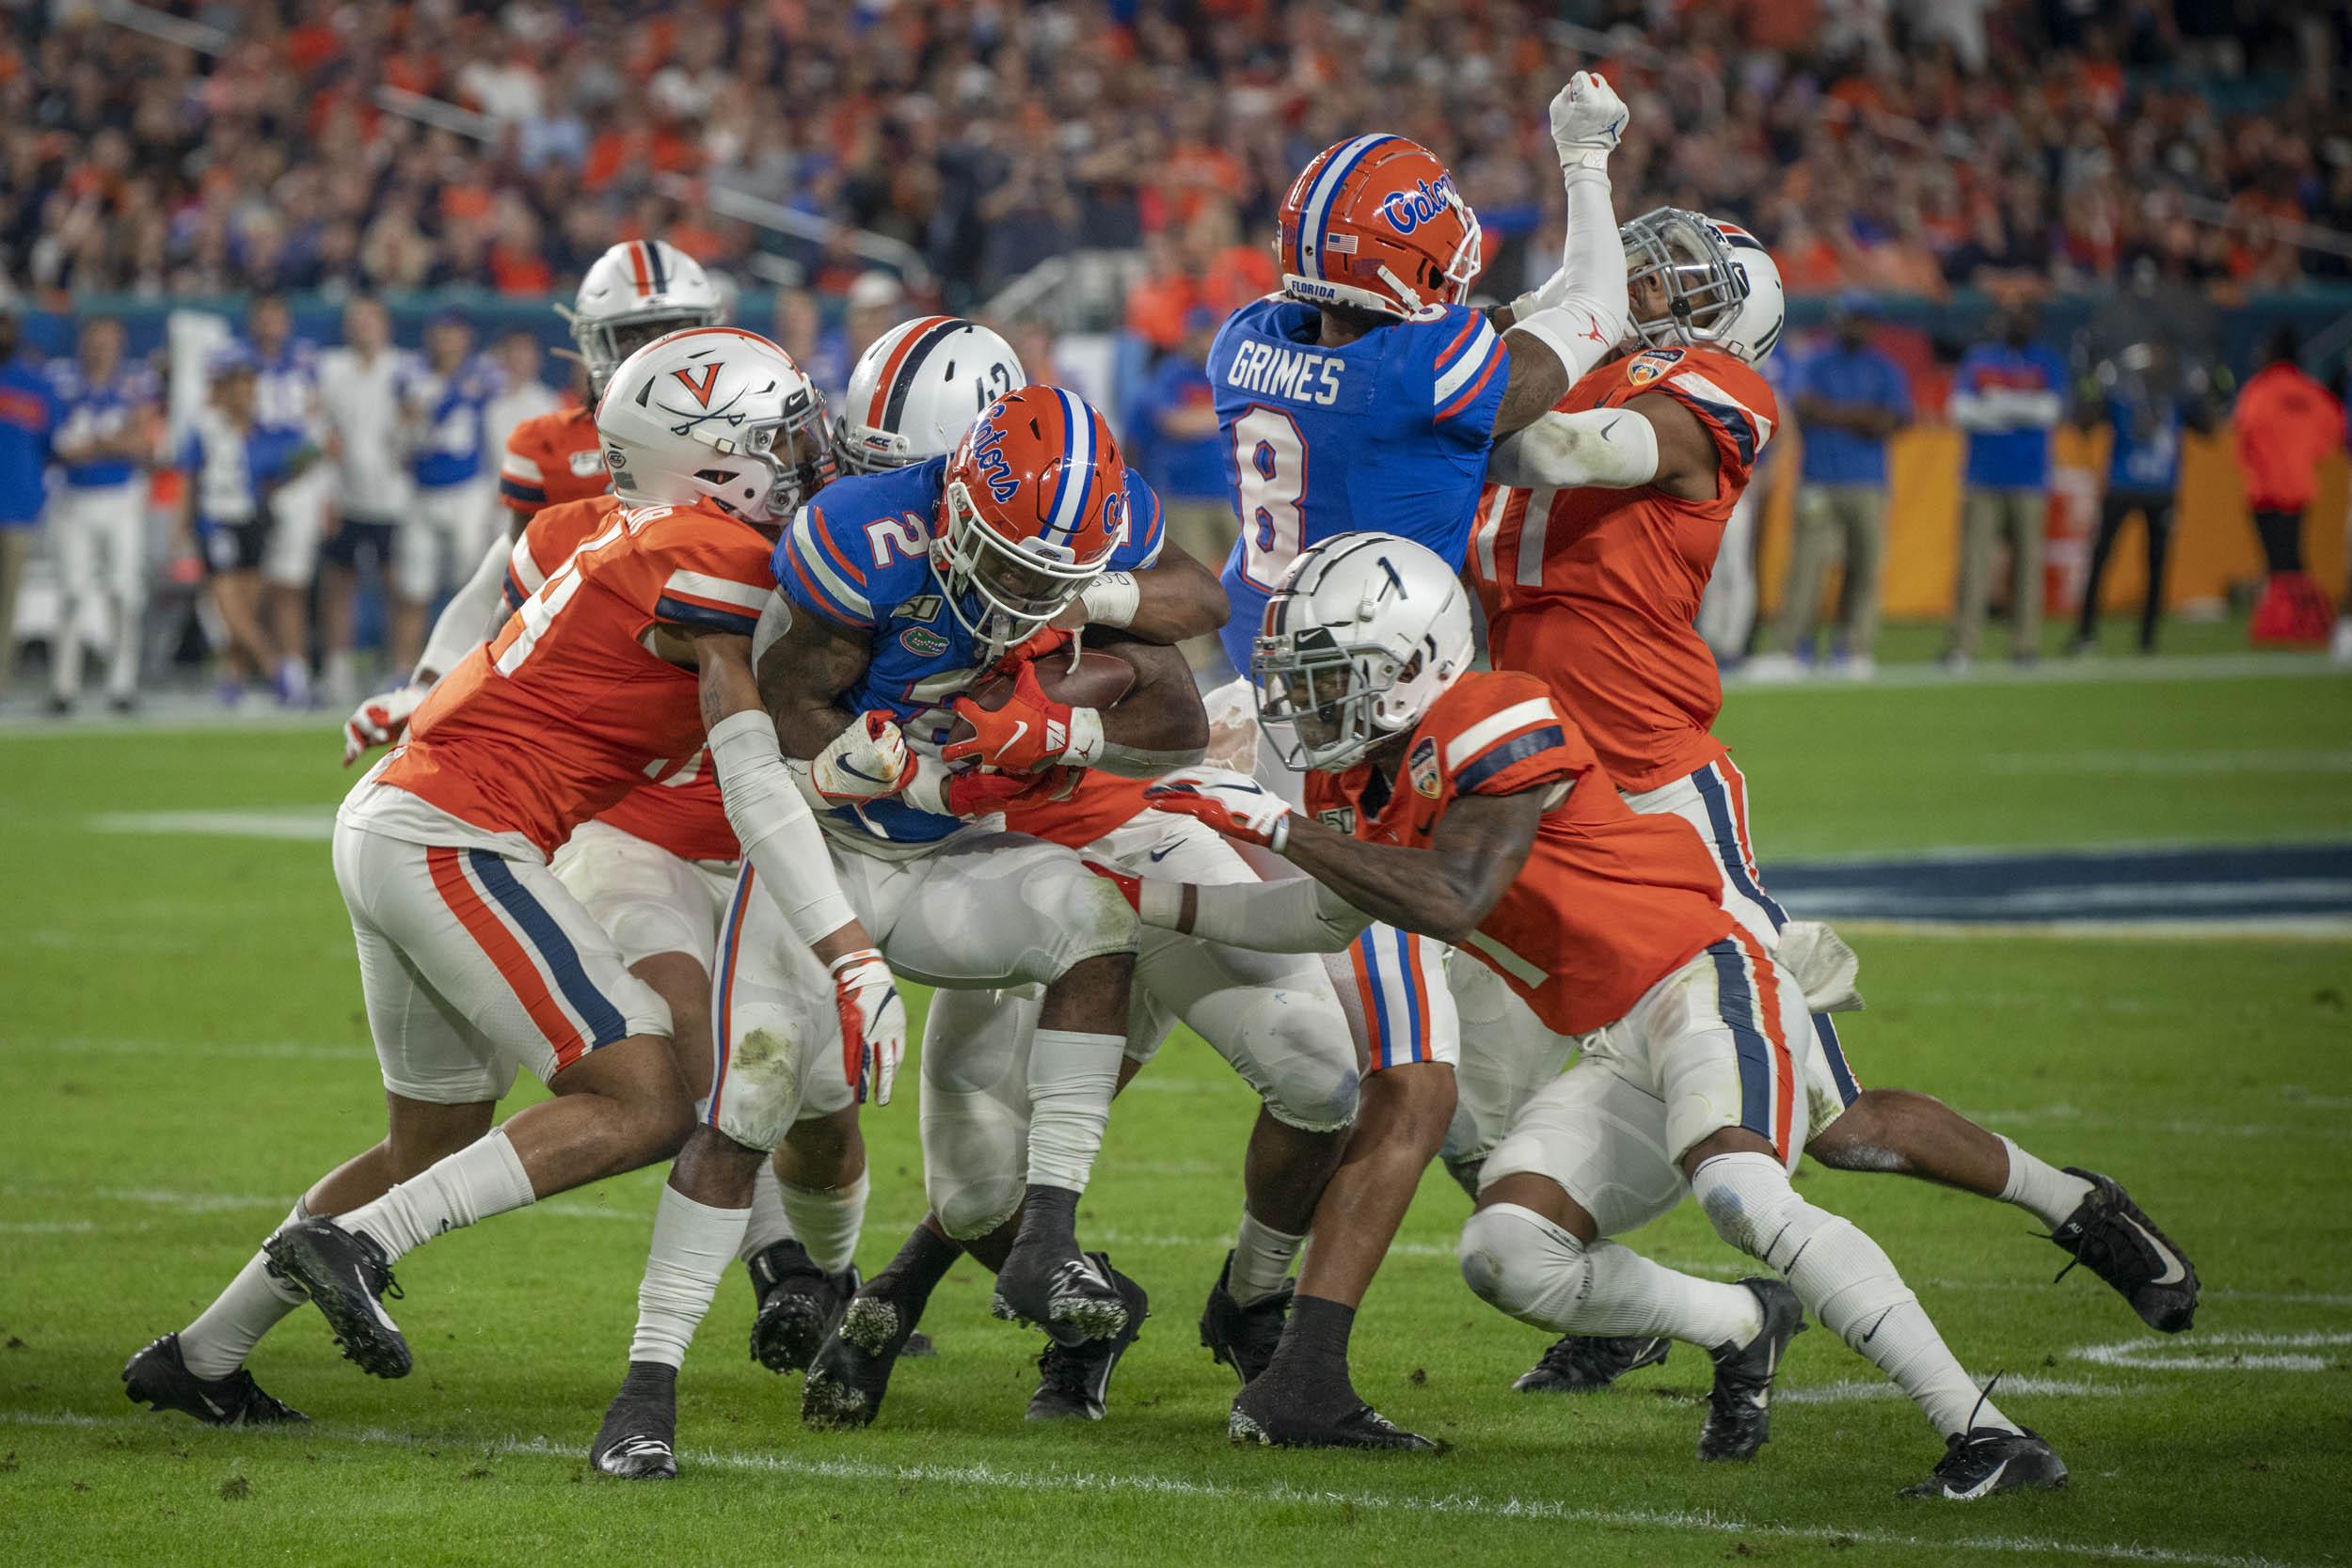 The UVA defense, here tackling star Florida running back Lamical Perine, played tough all night.